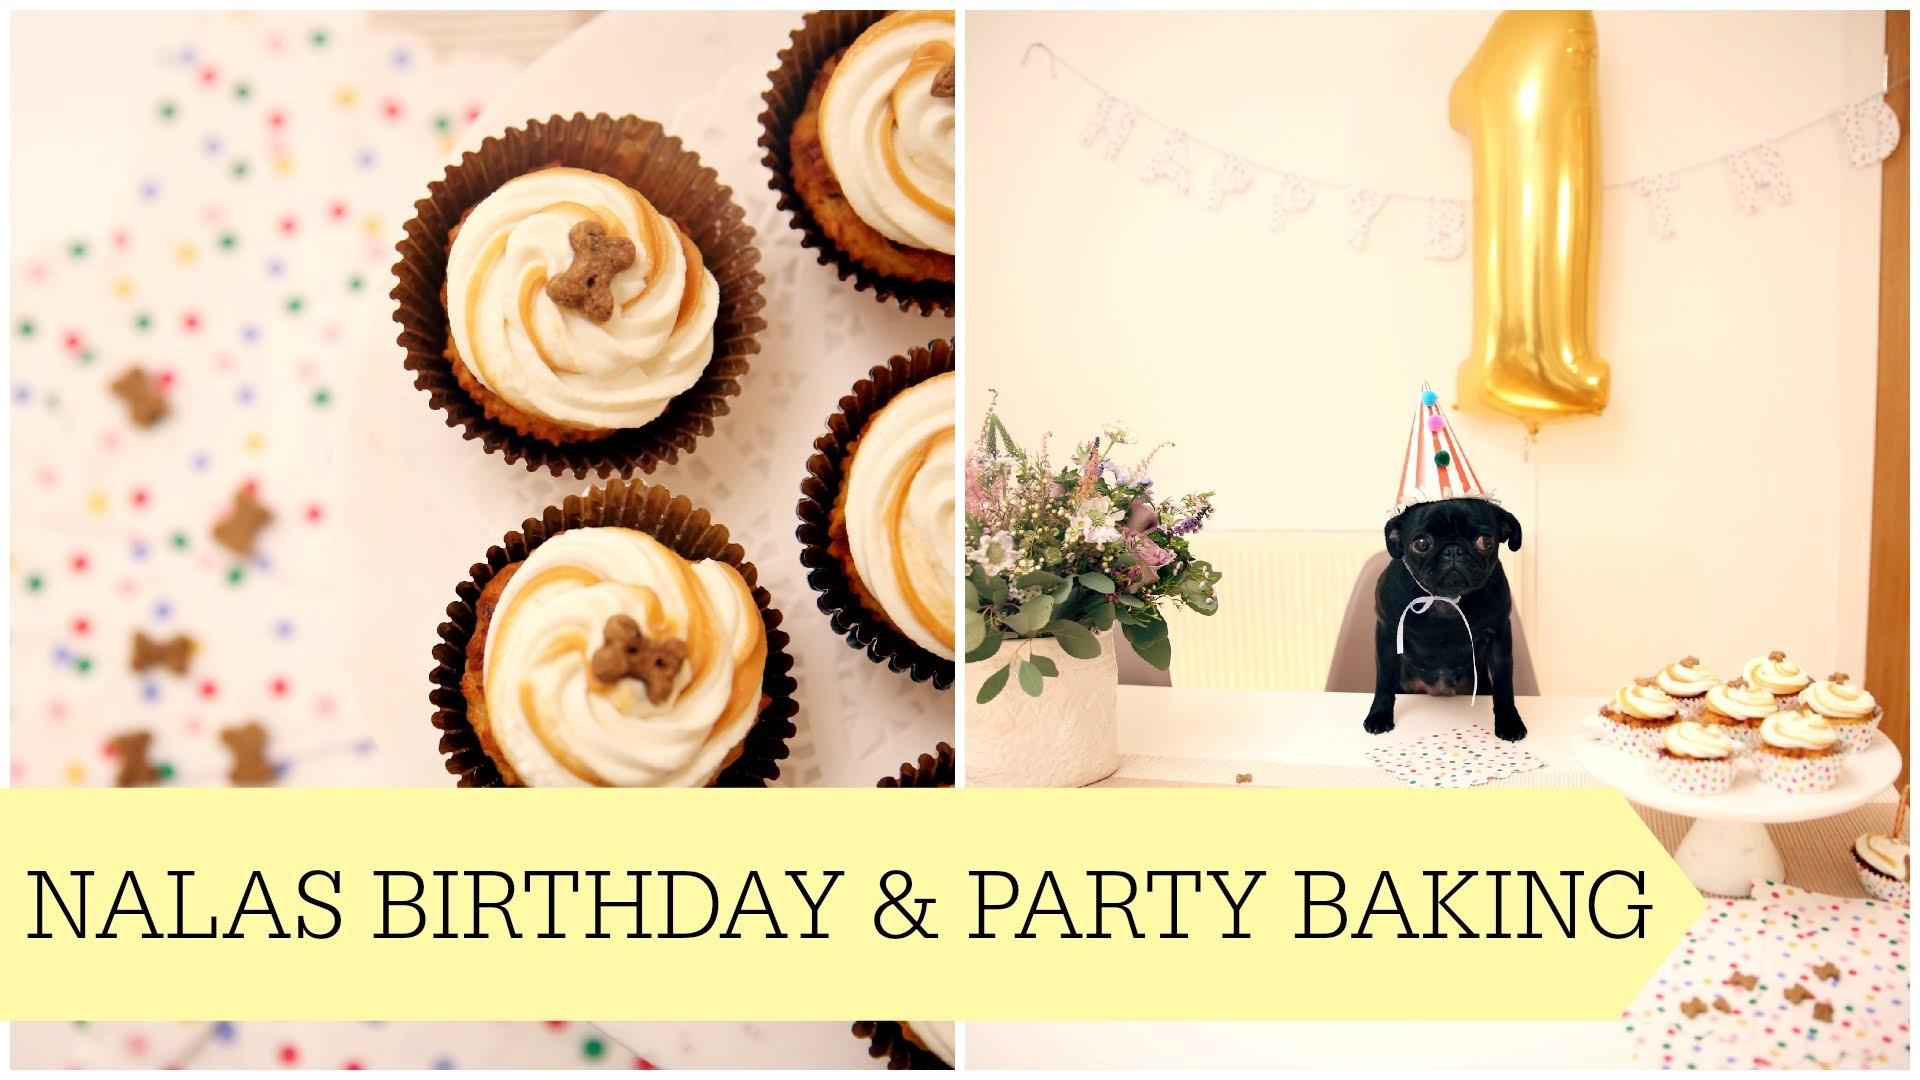 Nalas 1st Birthday & Puppy Party Baking